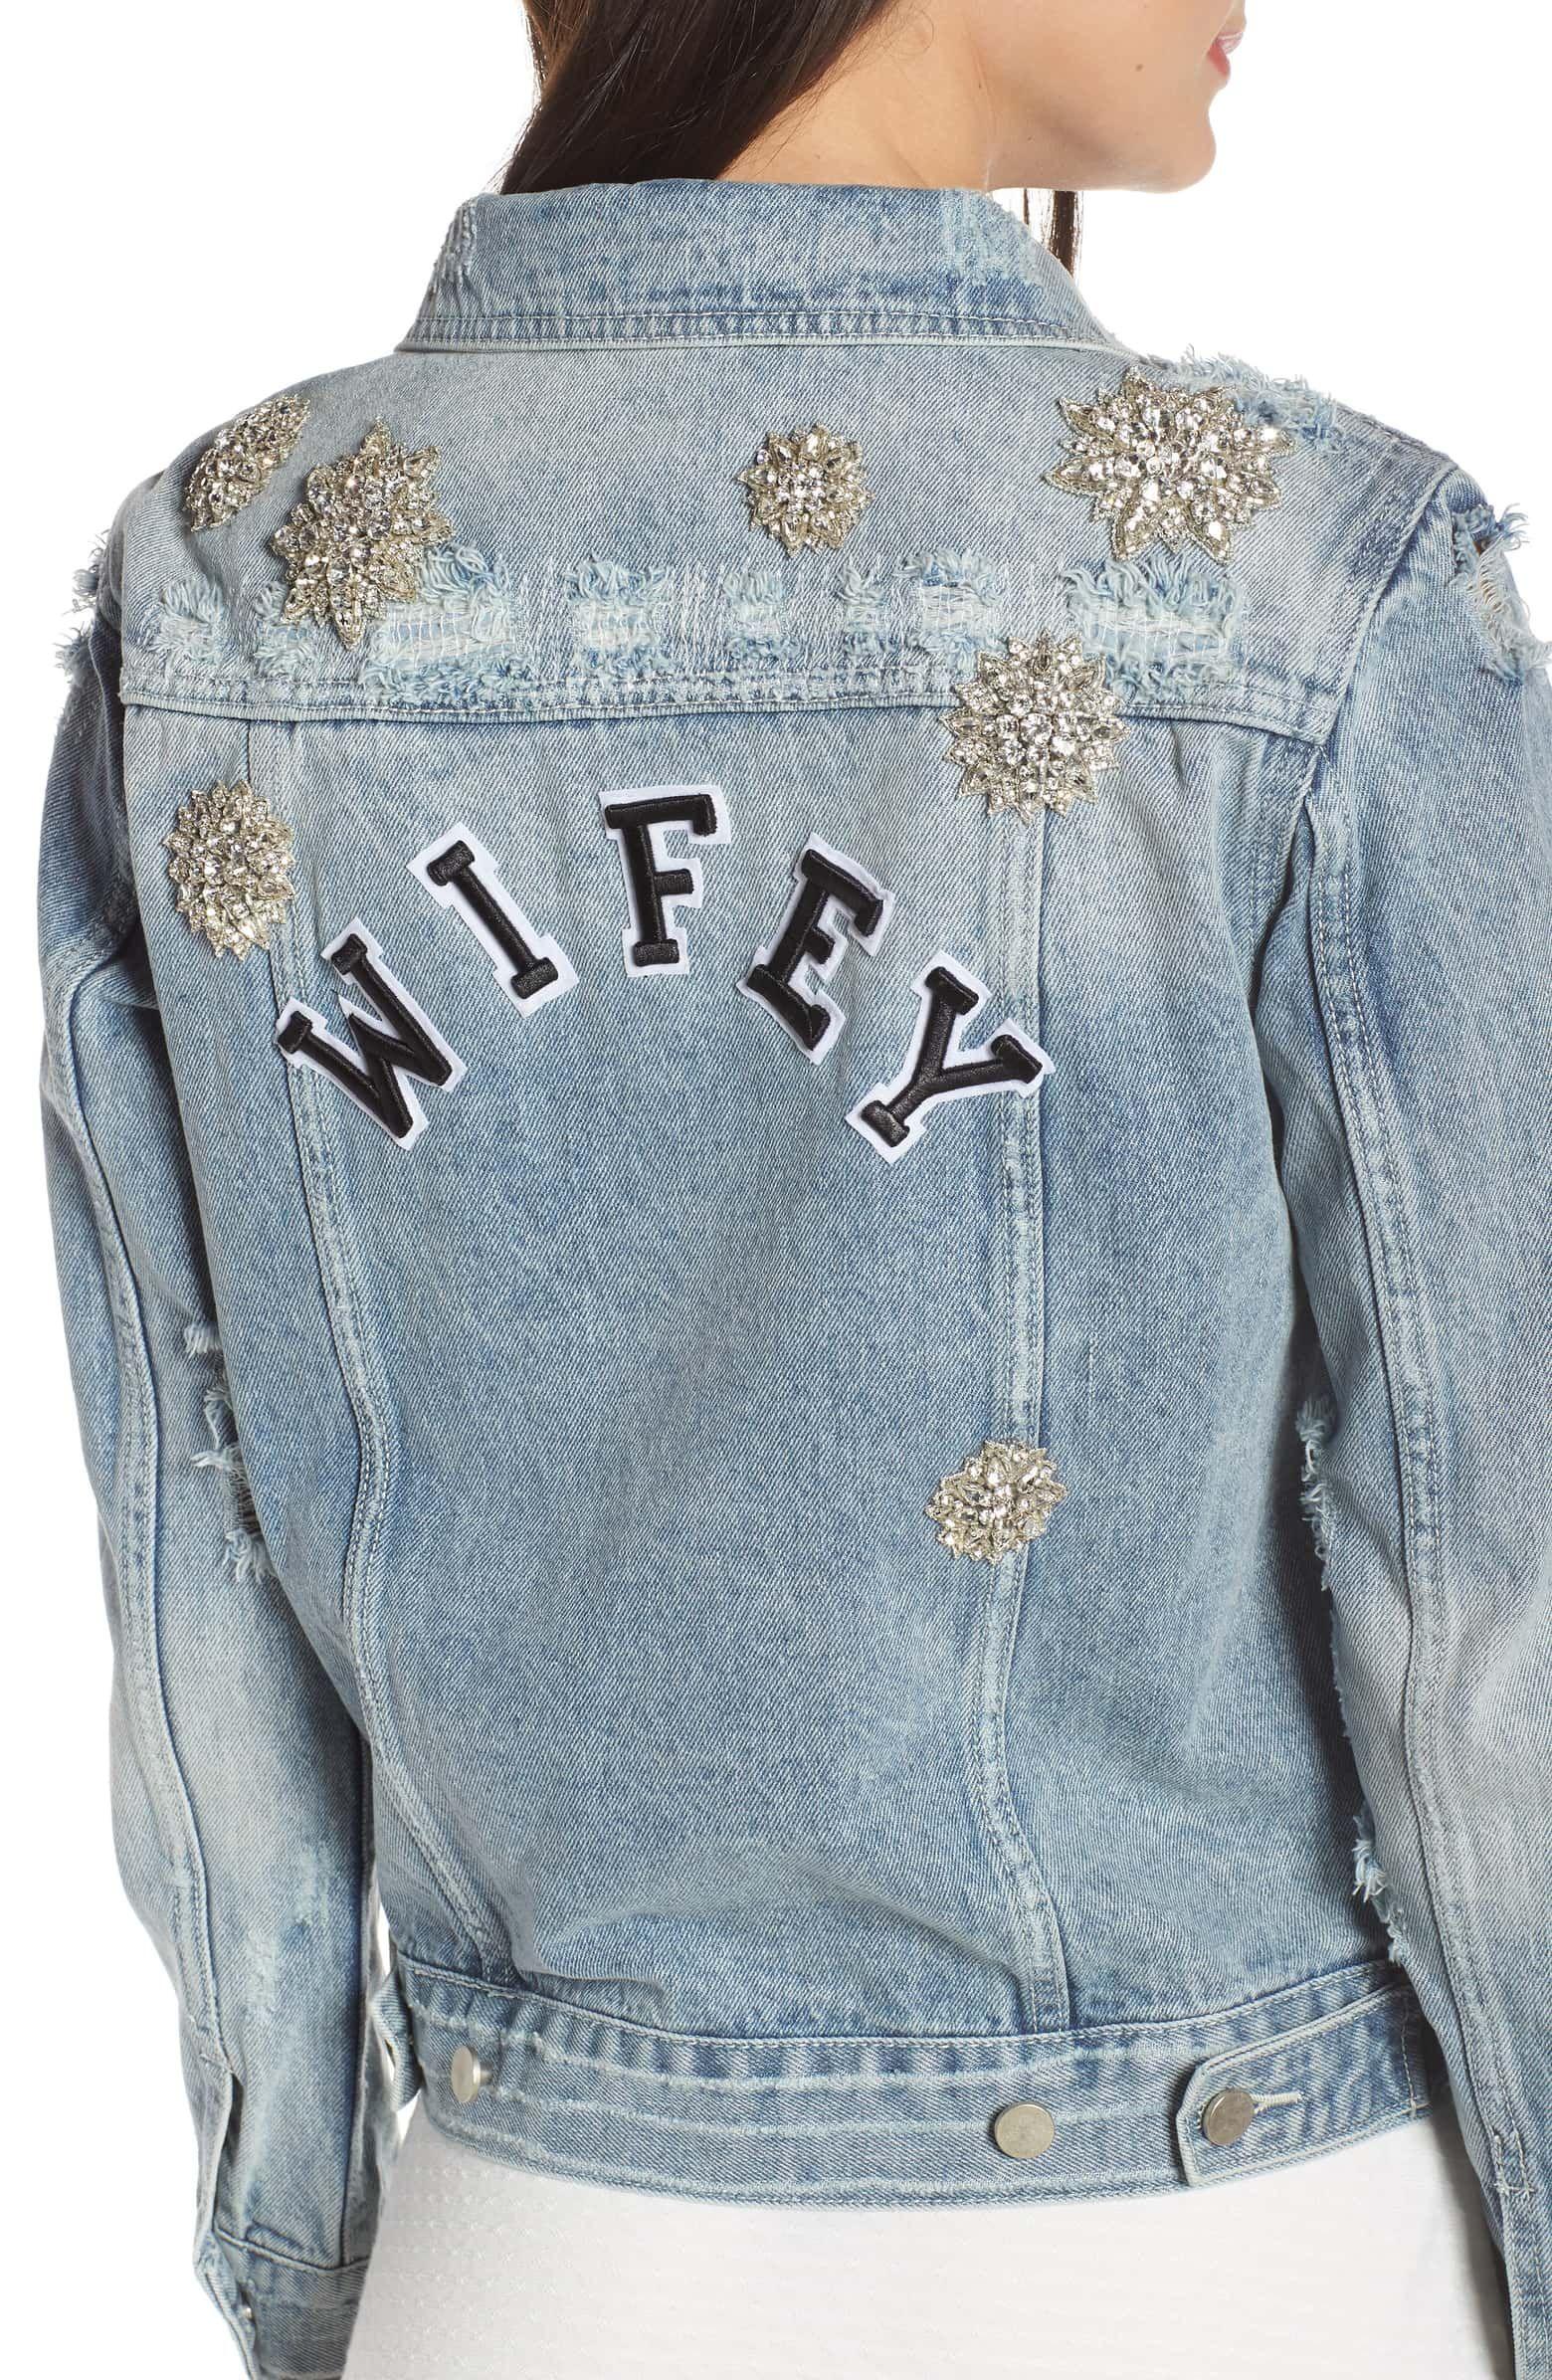 Chosen By One Day Wifey Embellished Denim Jacket Nordstrom Embellished Denim Denim Jacket Embellished Denim Jacket [ 2392 x 1560 Pixel ]